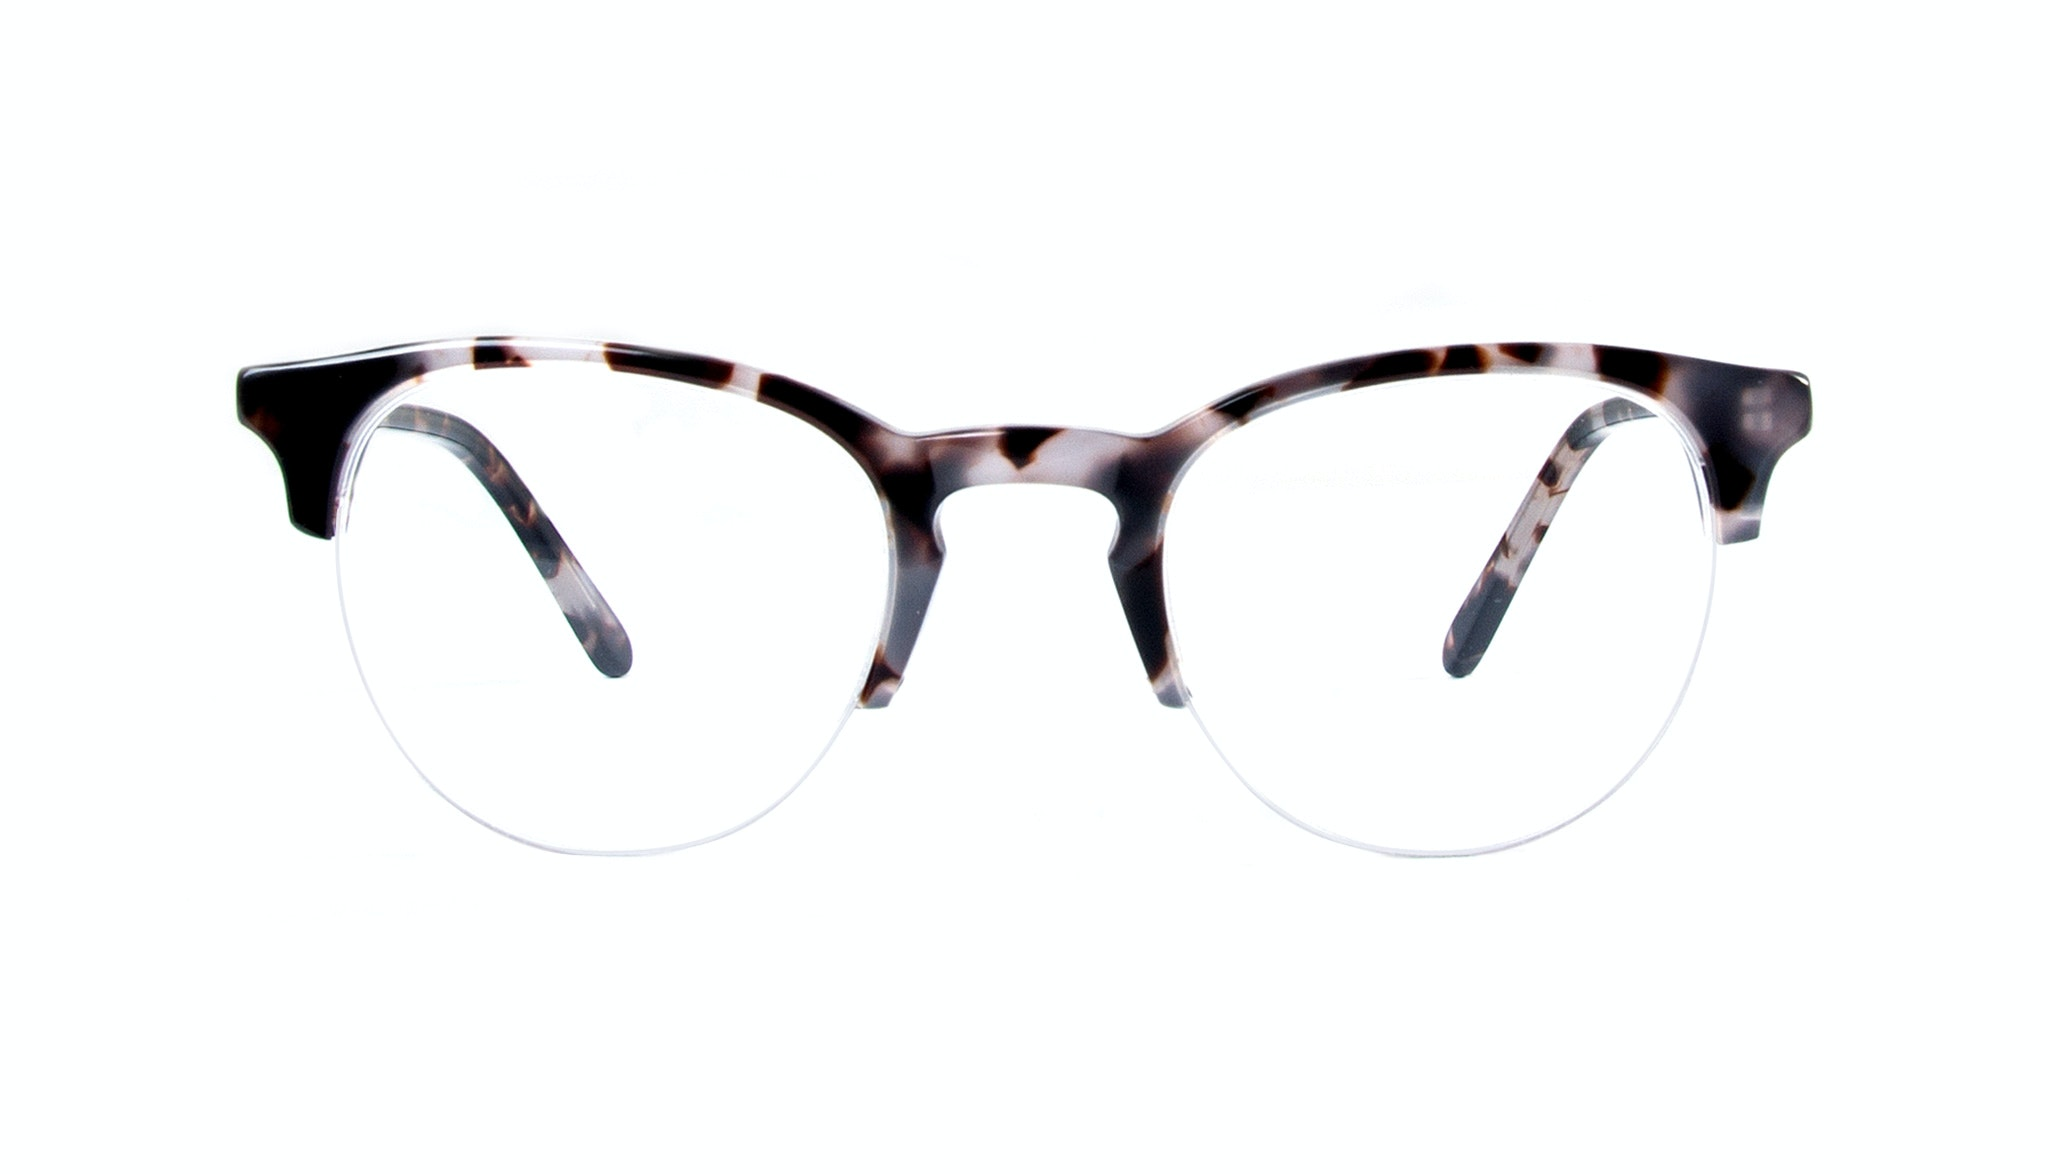 Affordable Fashion Glasses Round Semi-Rimless Eyeglasses Women Cult Light Mocha Tortoise